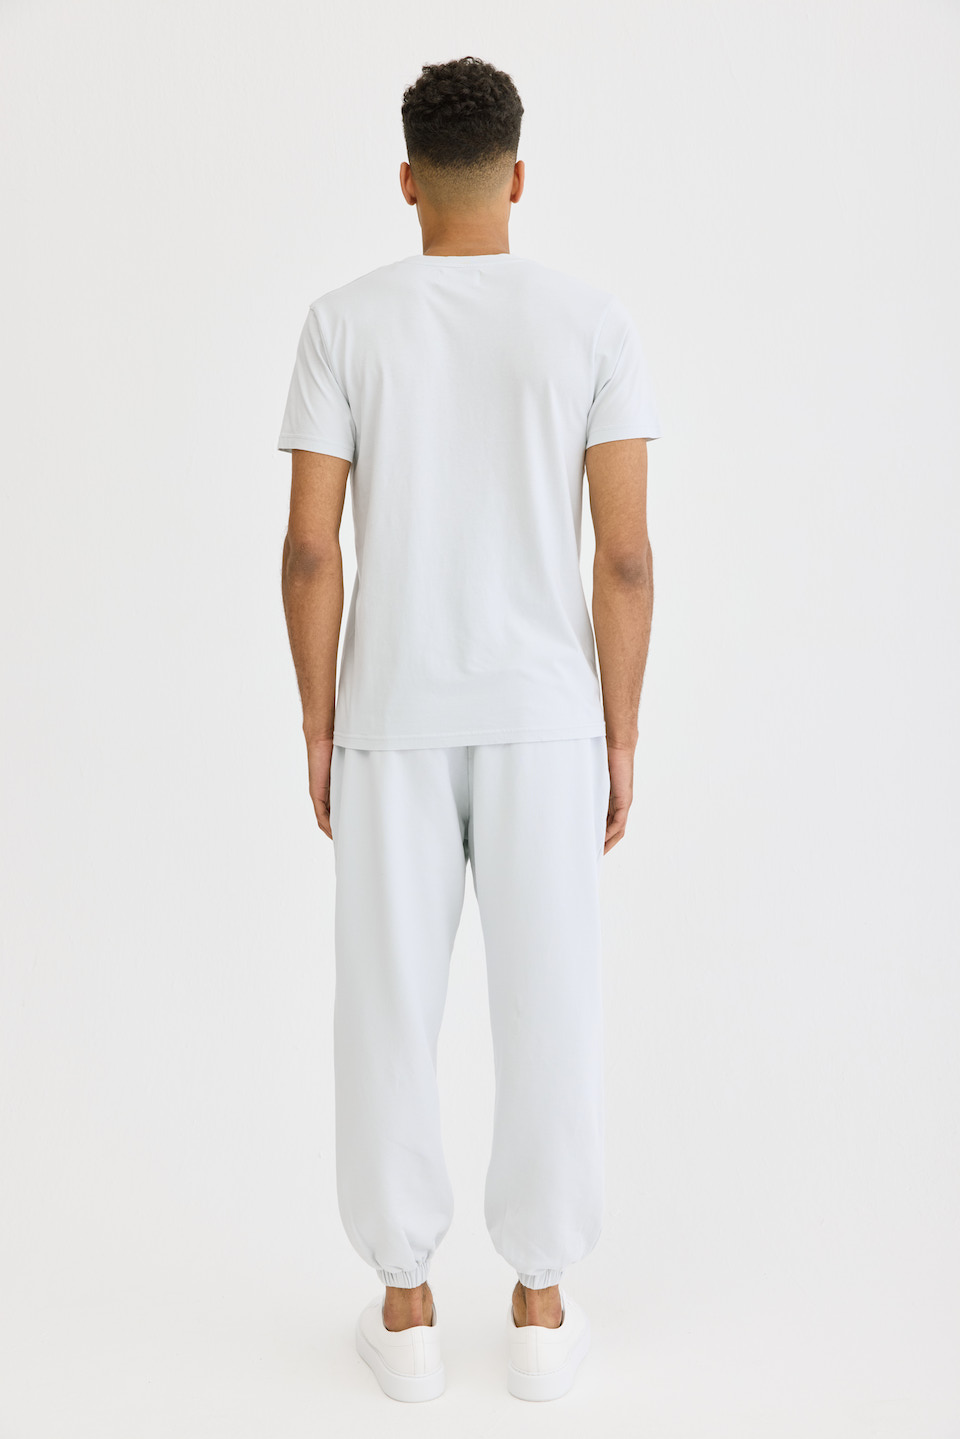 CPH Shirt 1M org. cotton light grey - alternative 2